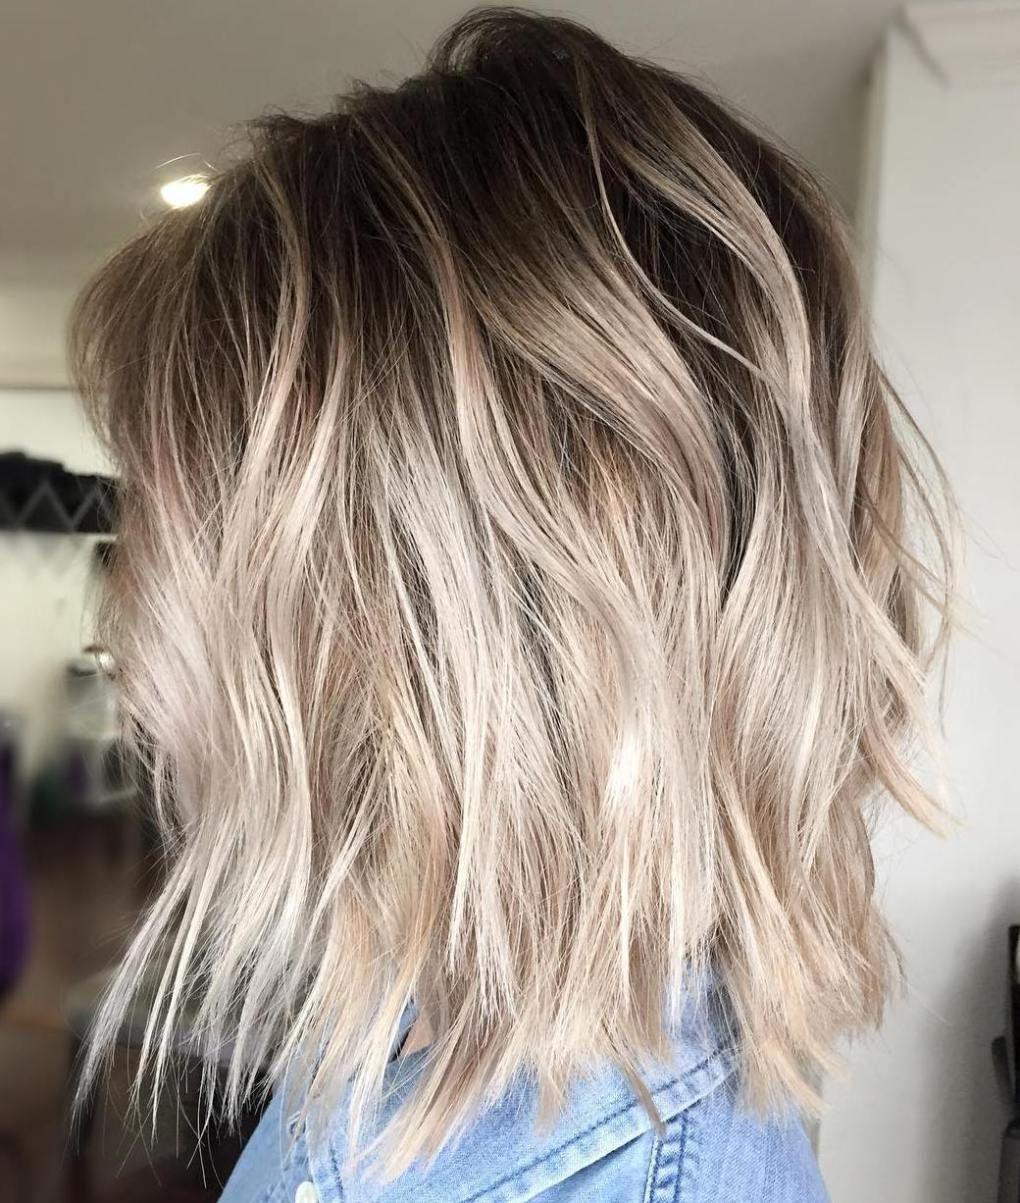 40 Beautiful Blonde Balayage Looks Short Hair Balayage Hair Styles Blonde Balayage Bob